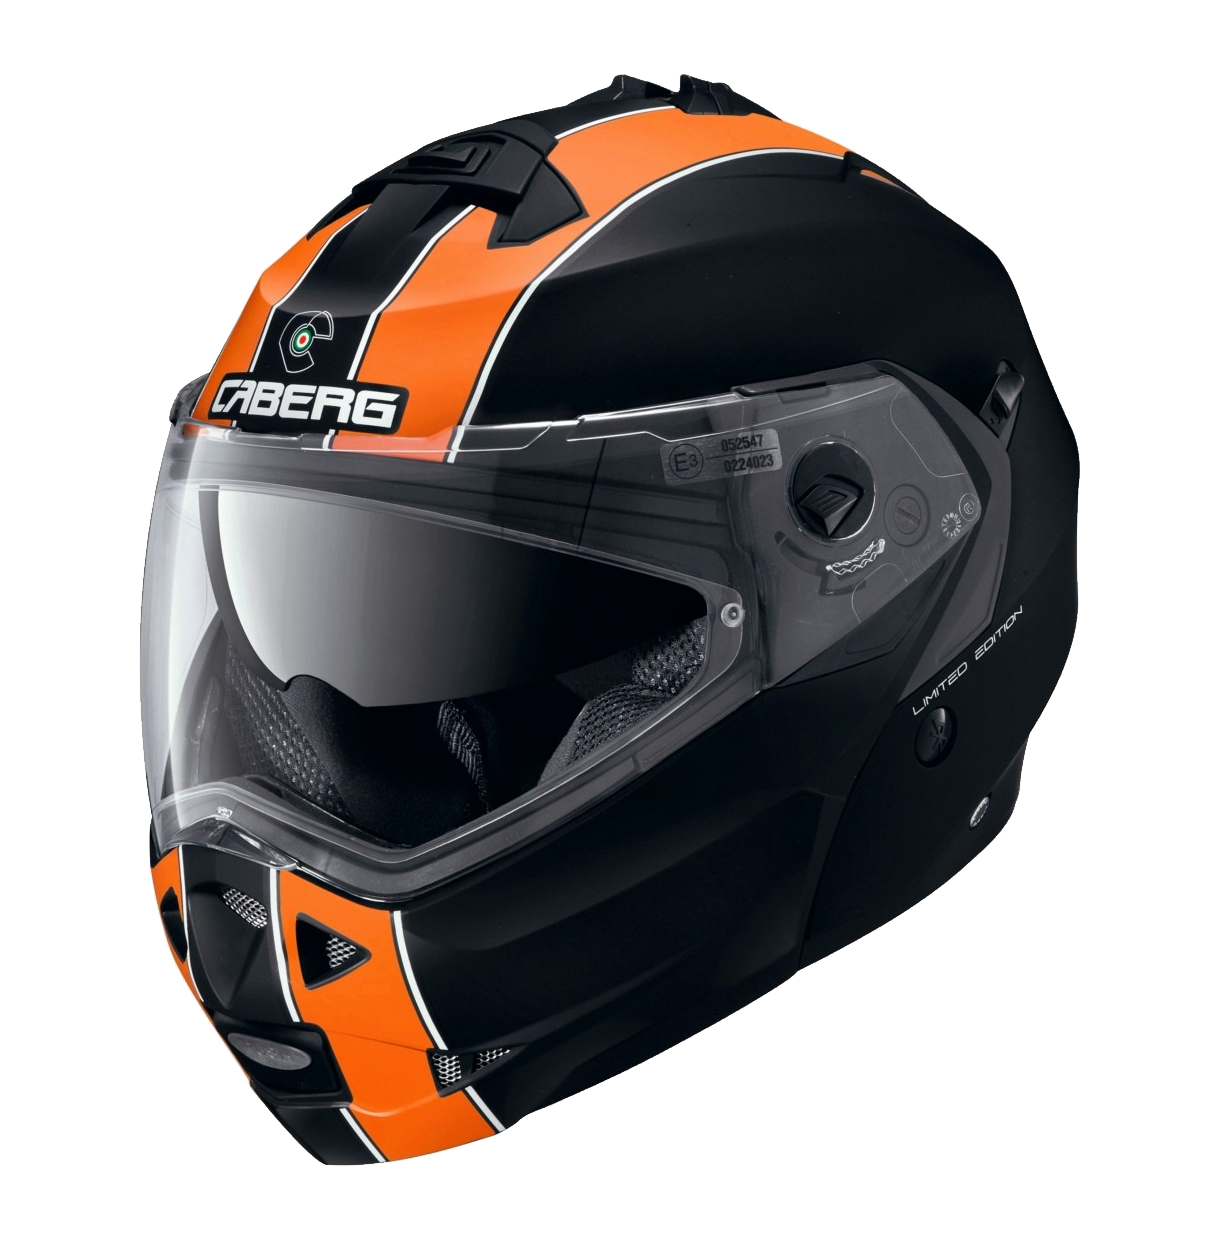 Helmet clipart orange. Motorcycle helmets png picture